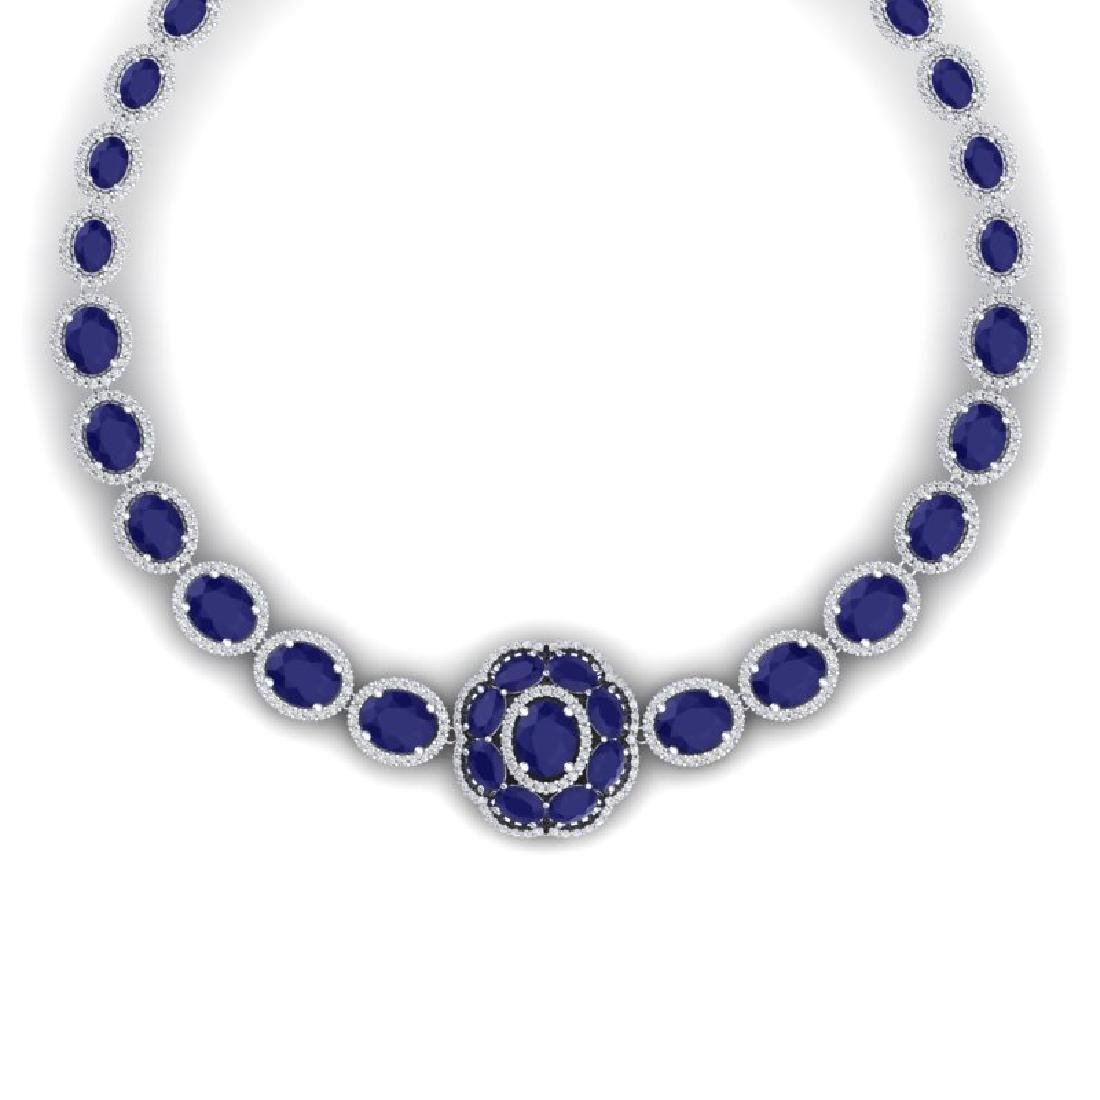 58.33 CTW Royalty Sapphire & VS Diamond Necklace 18K - 2